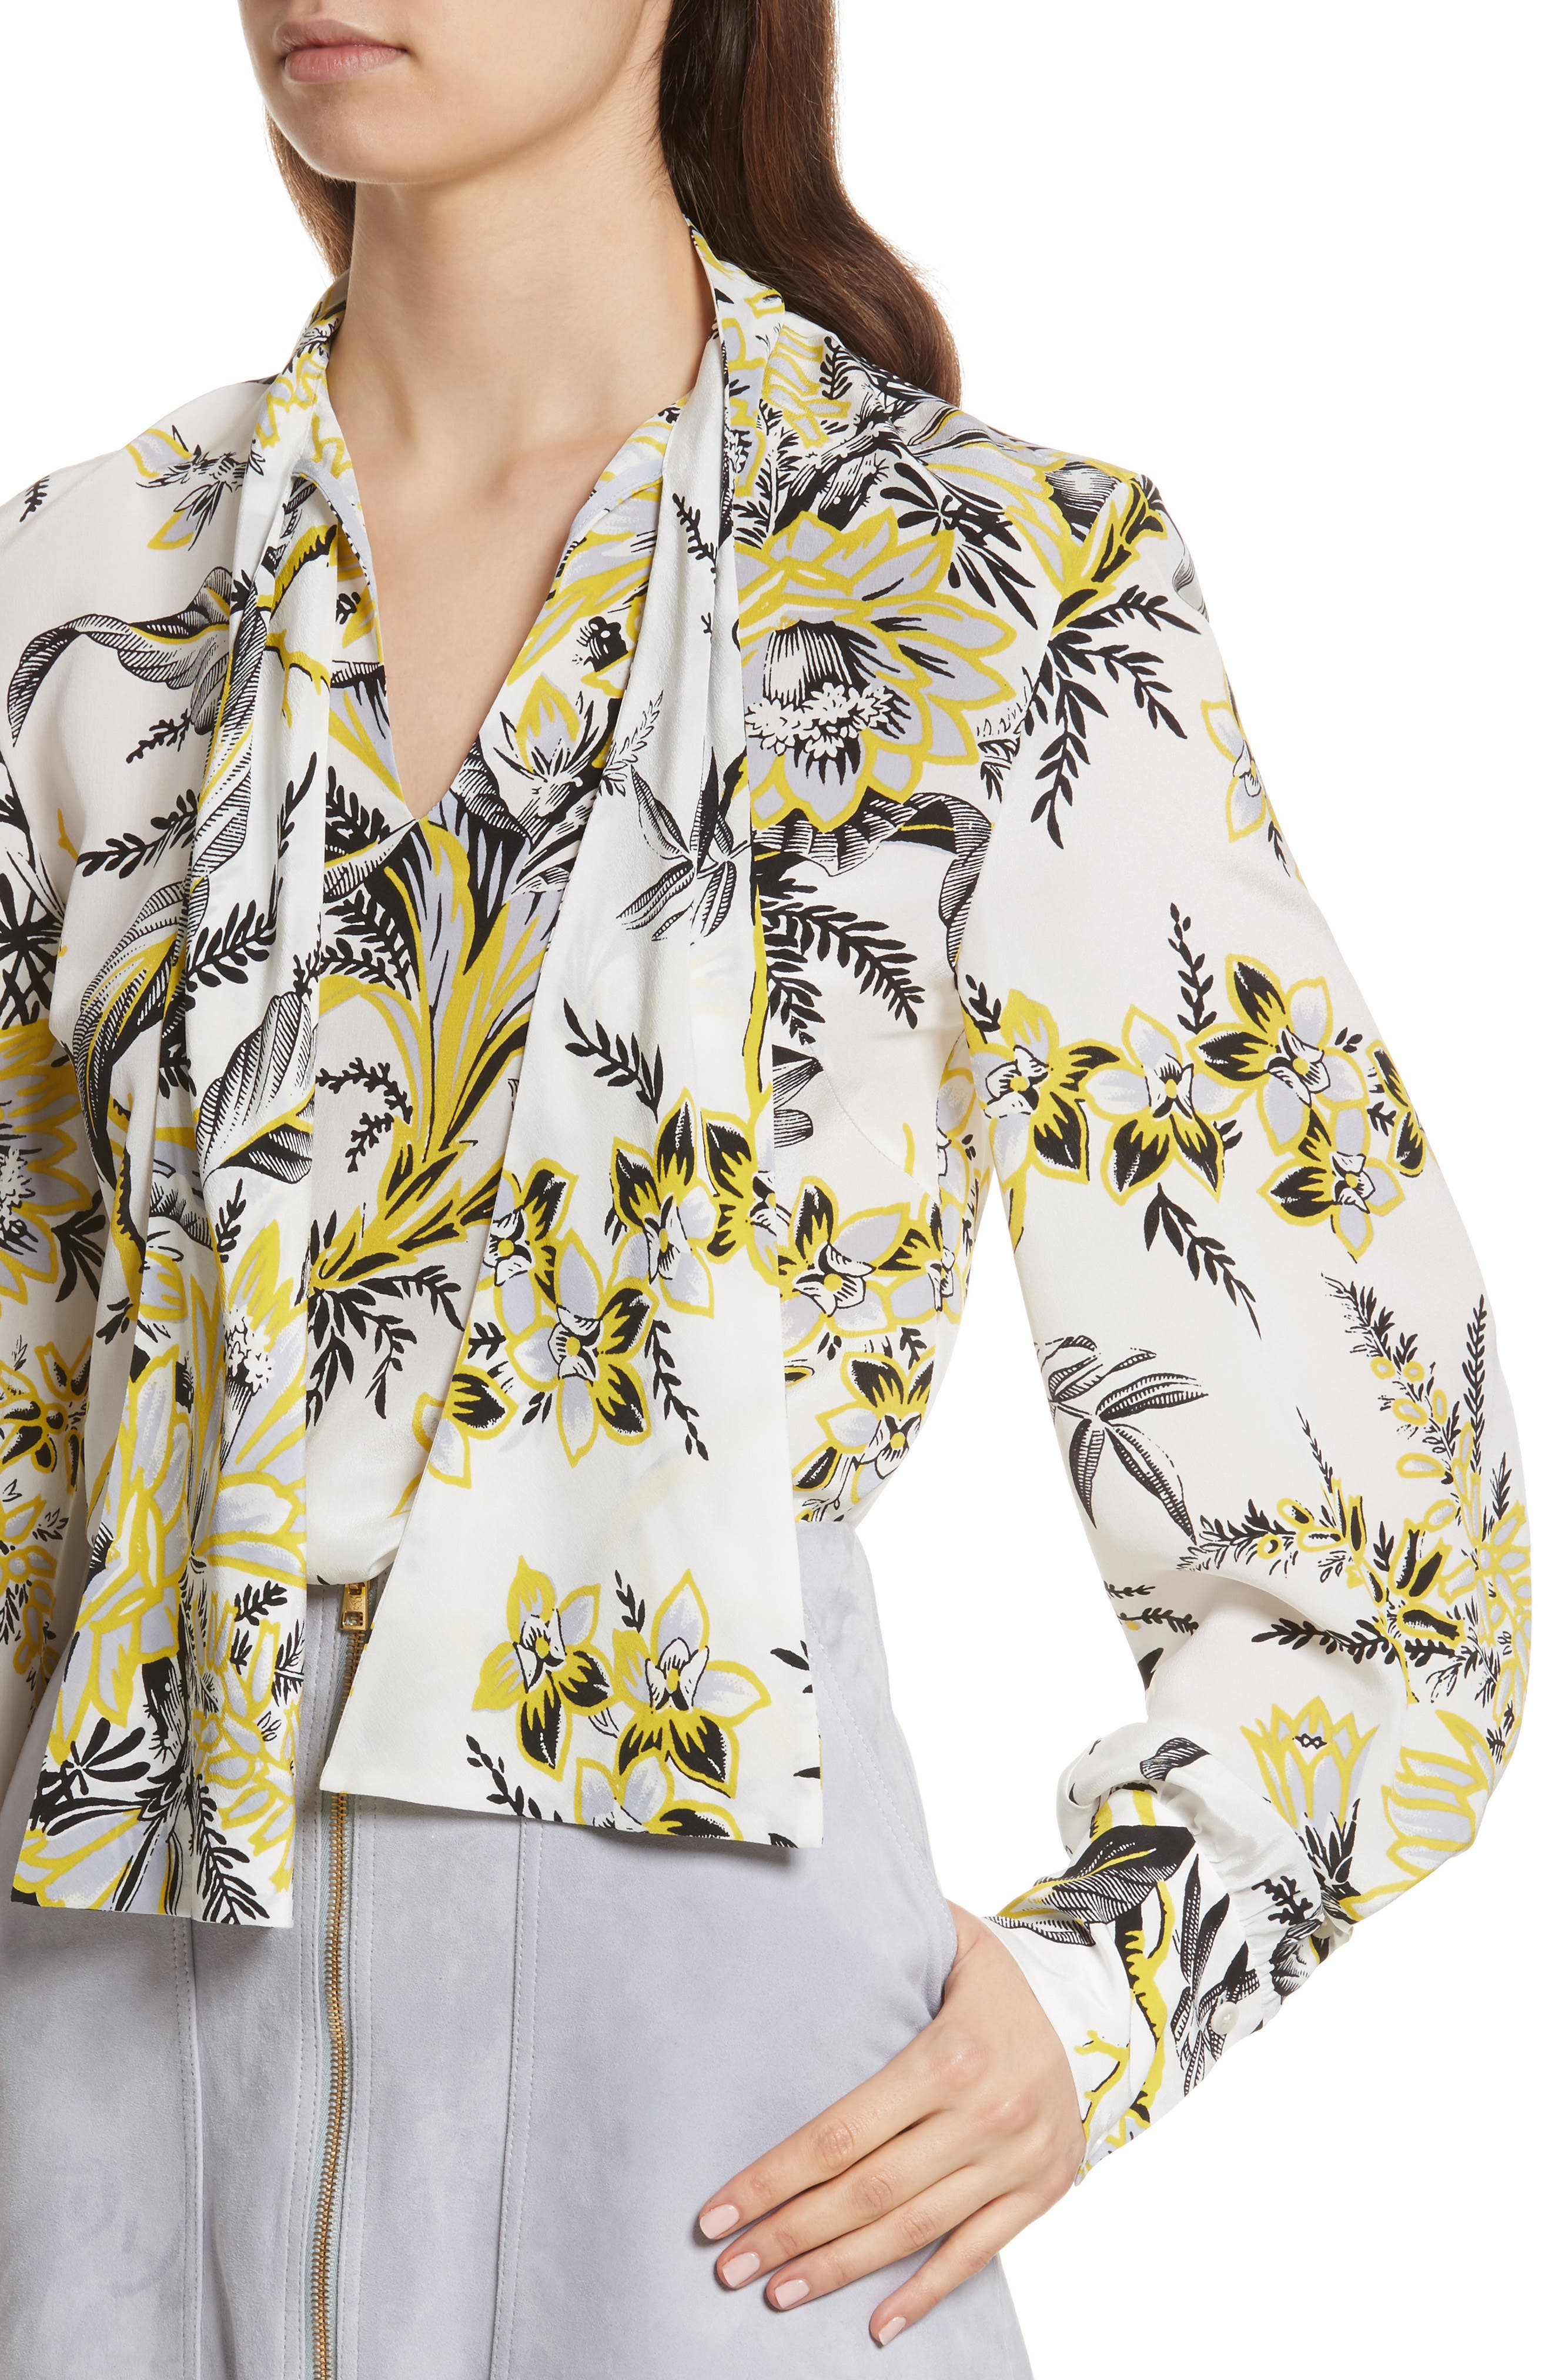 Diane von Furstenberg Tie Neck Silk Blouse,                             Alternate thumbnail 4, color,                             189